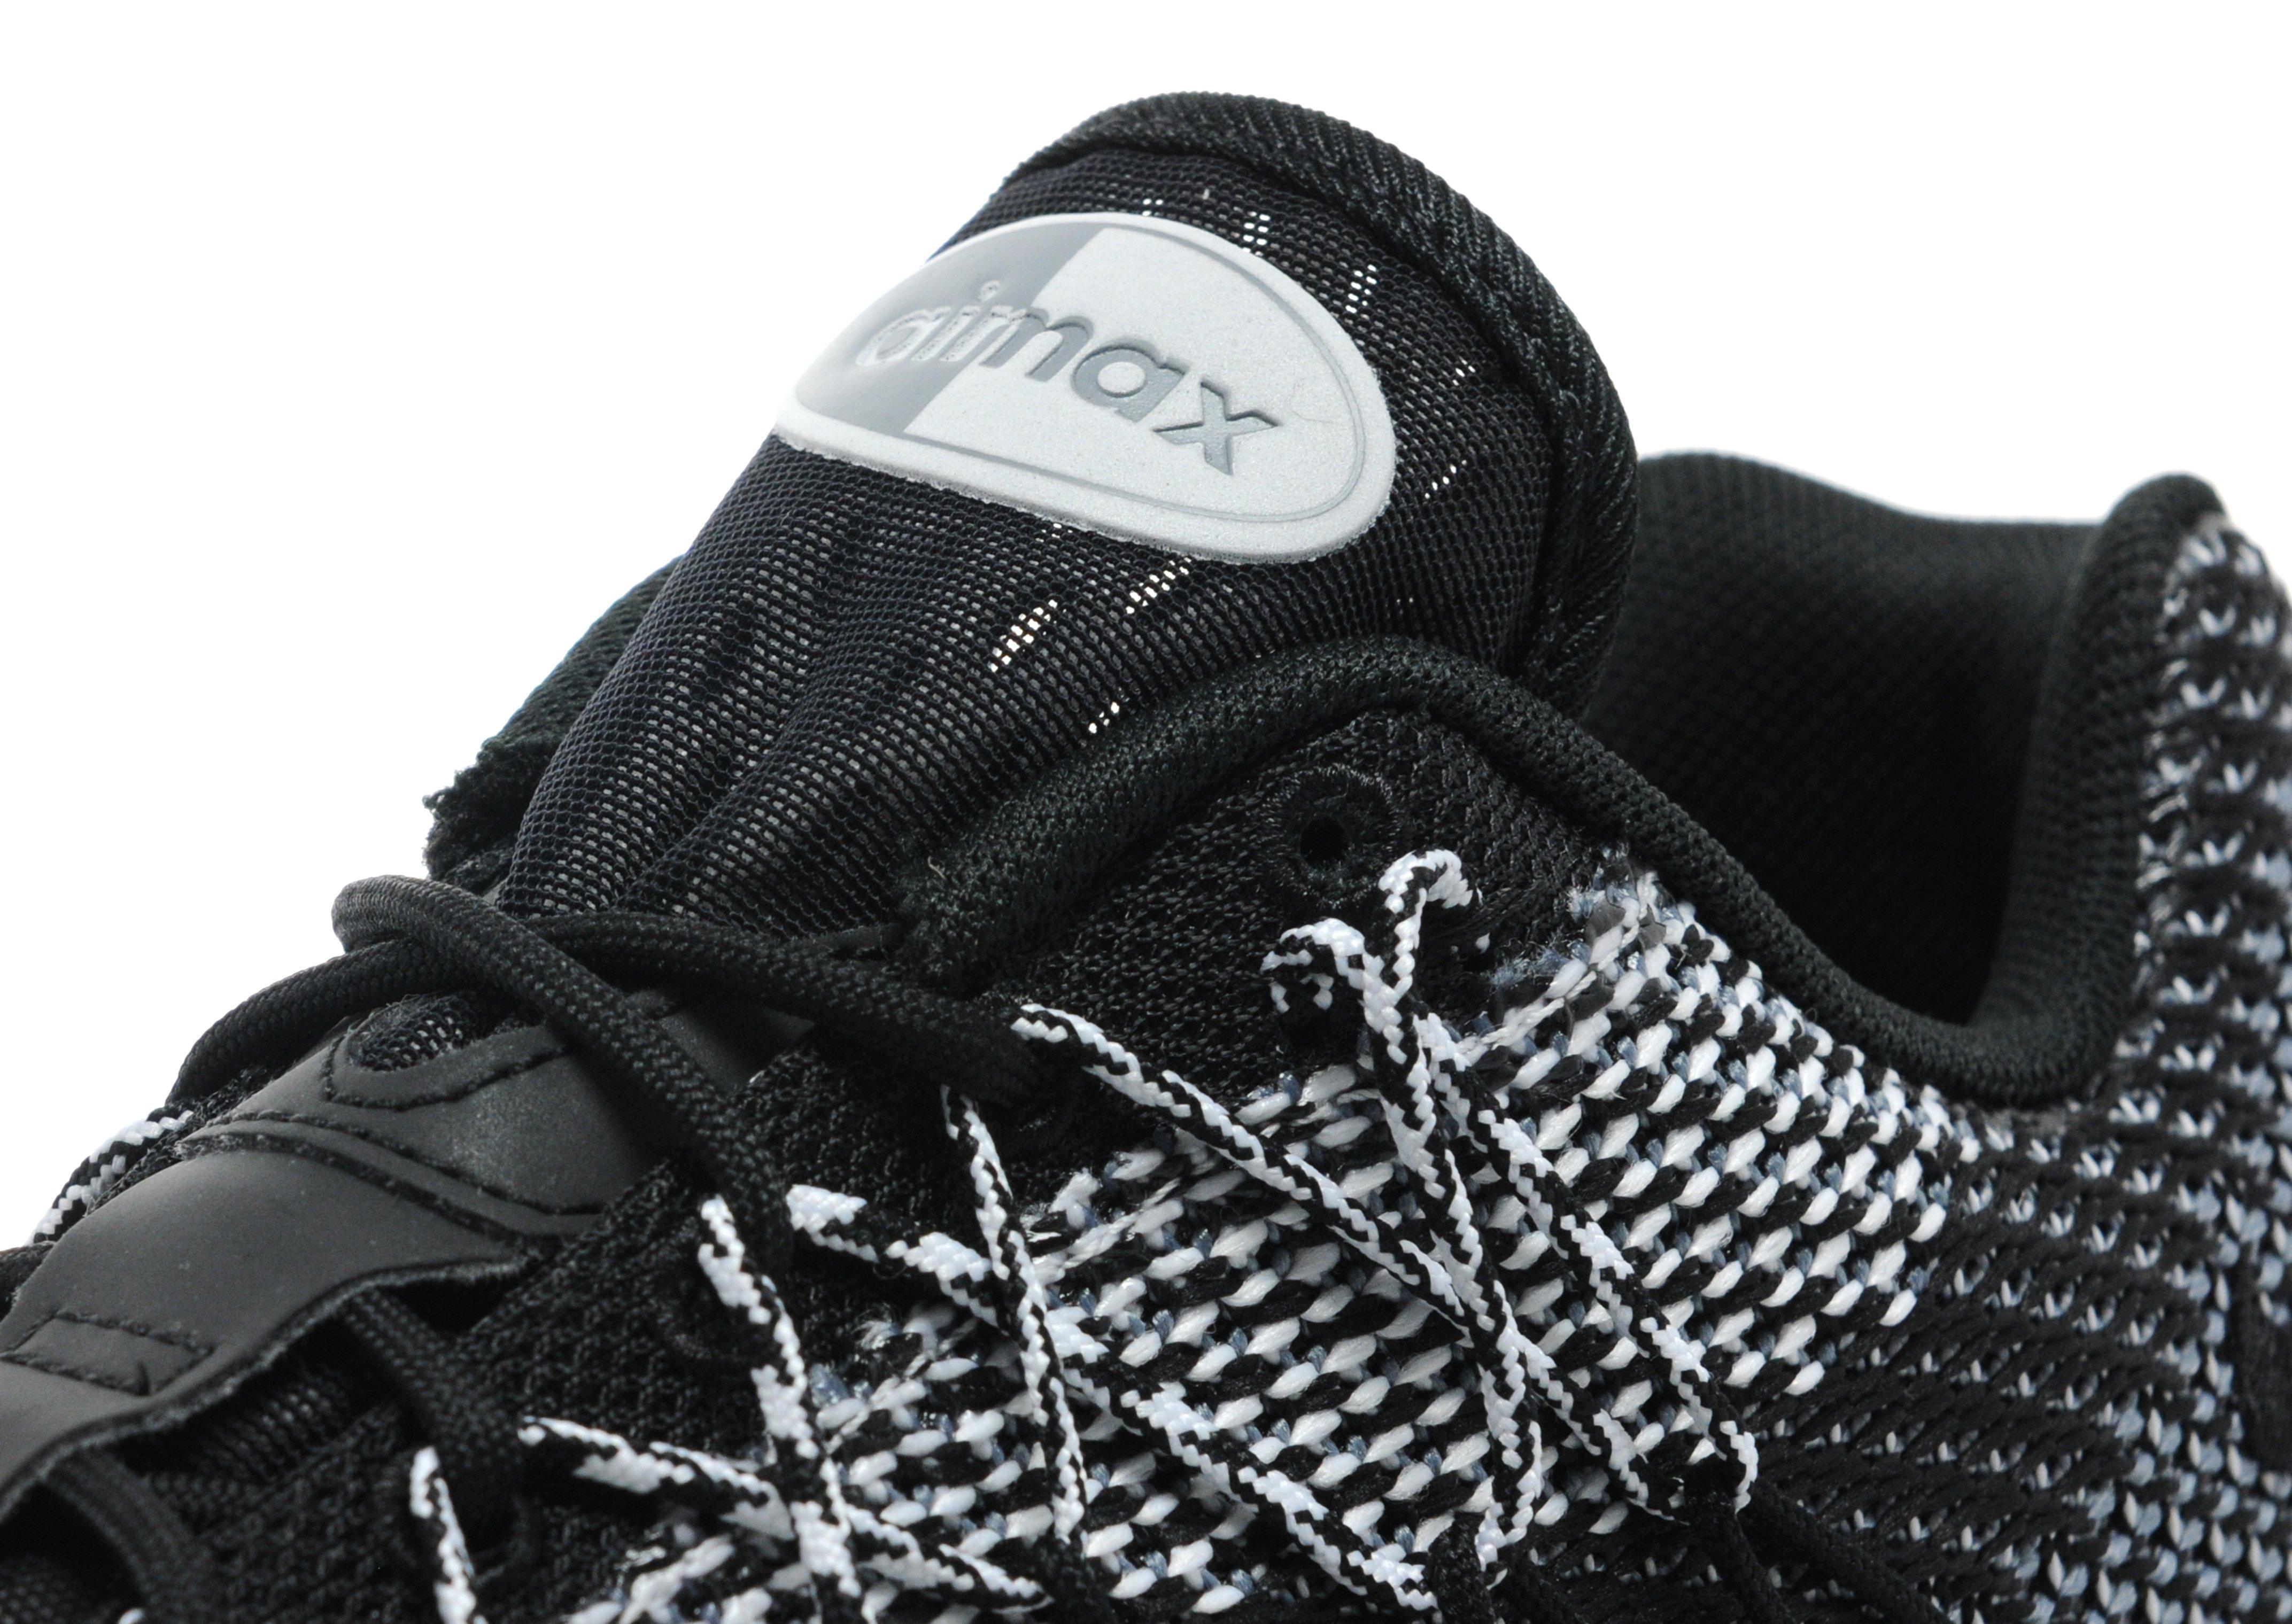 WomenMen Nike Air Max 95 Ultra Jacquard GreyWhite Latest